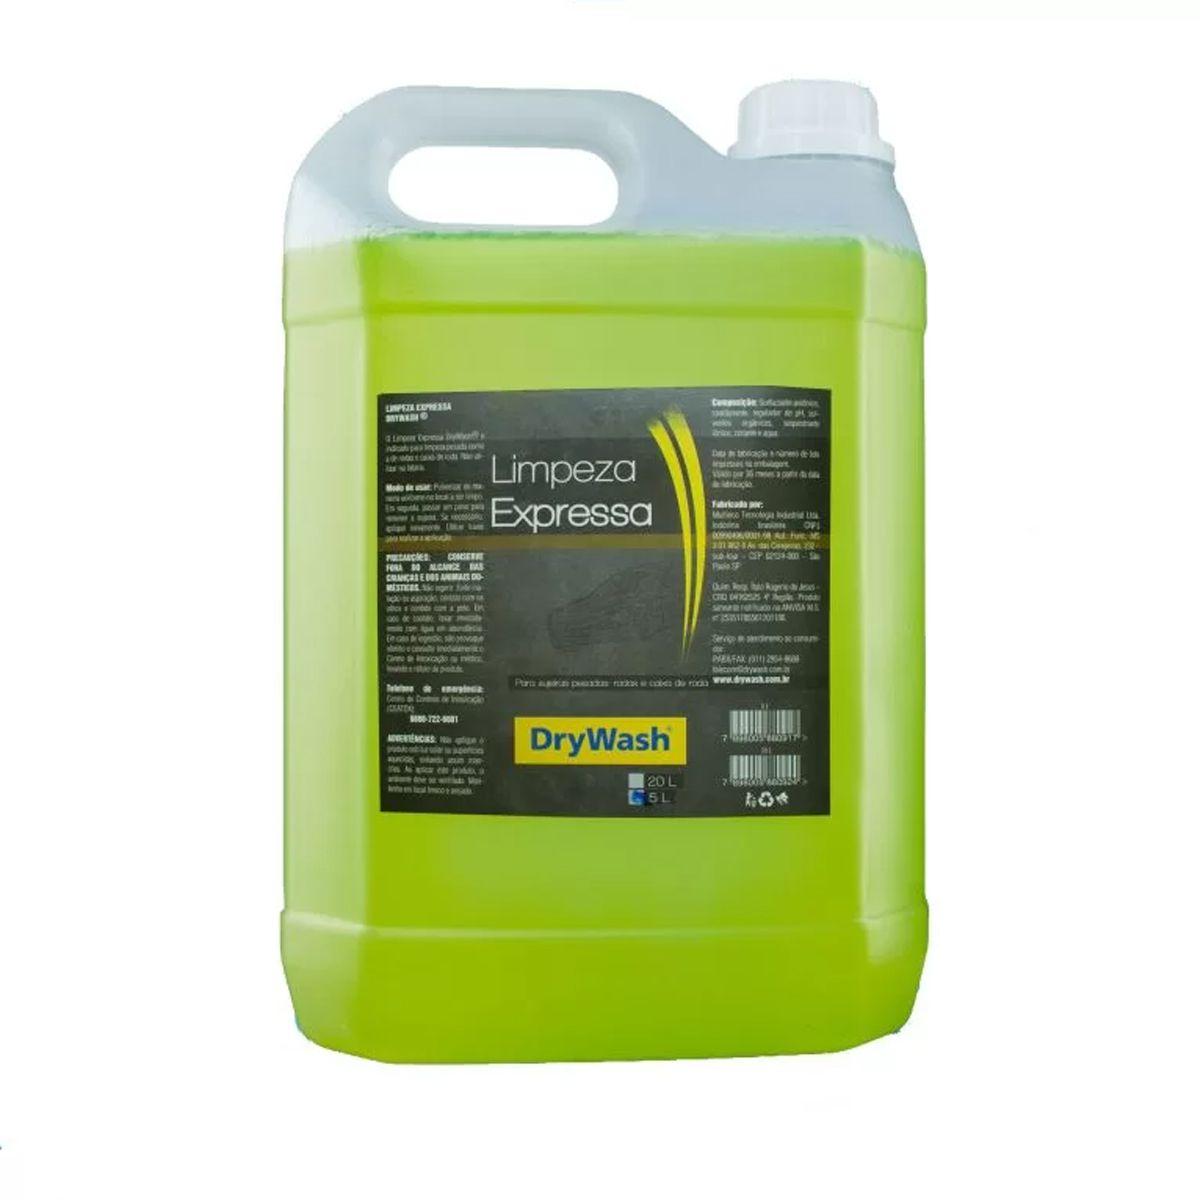 Limpeza Expressa Drywash 5 Litros